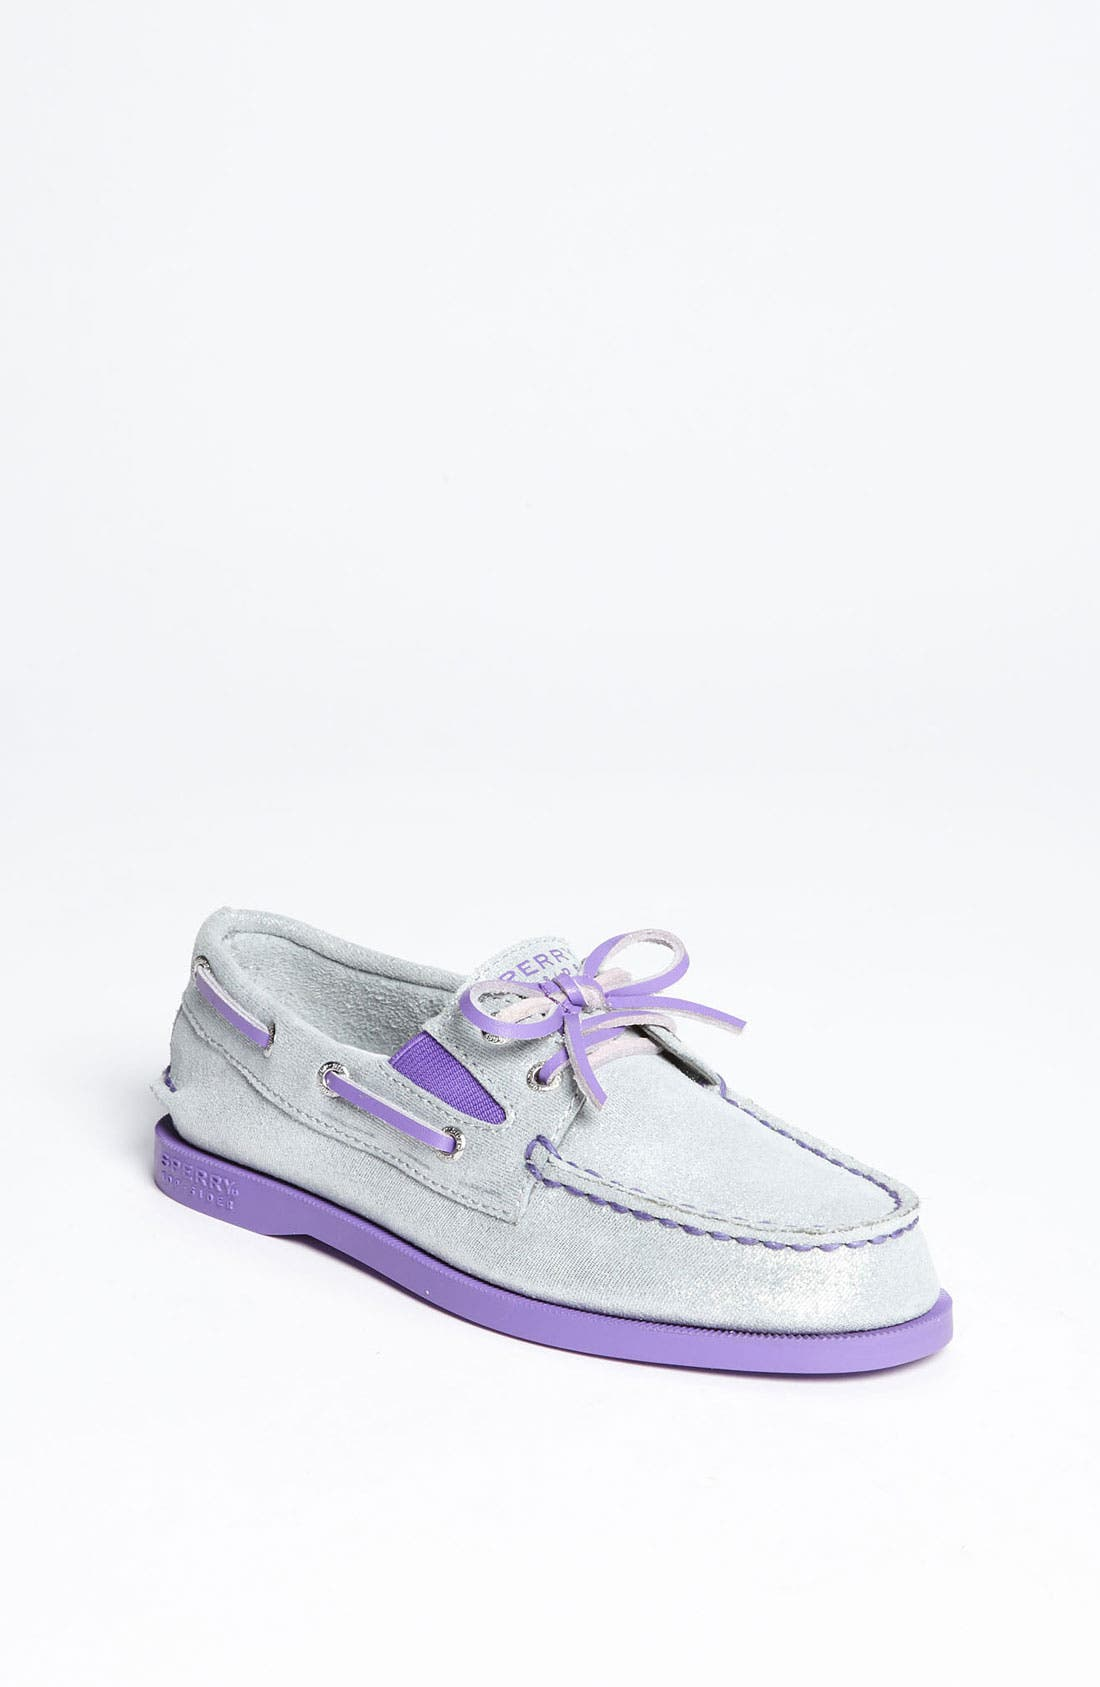 Main Image - Sperry Top-Sider® Kids 'Authentic Original' Boat Shoe (Walker, Toddler, Little Kid & Big Kid)